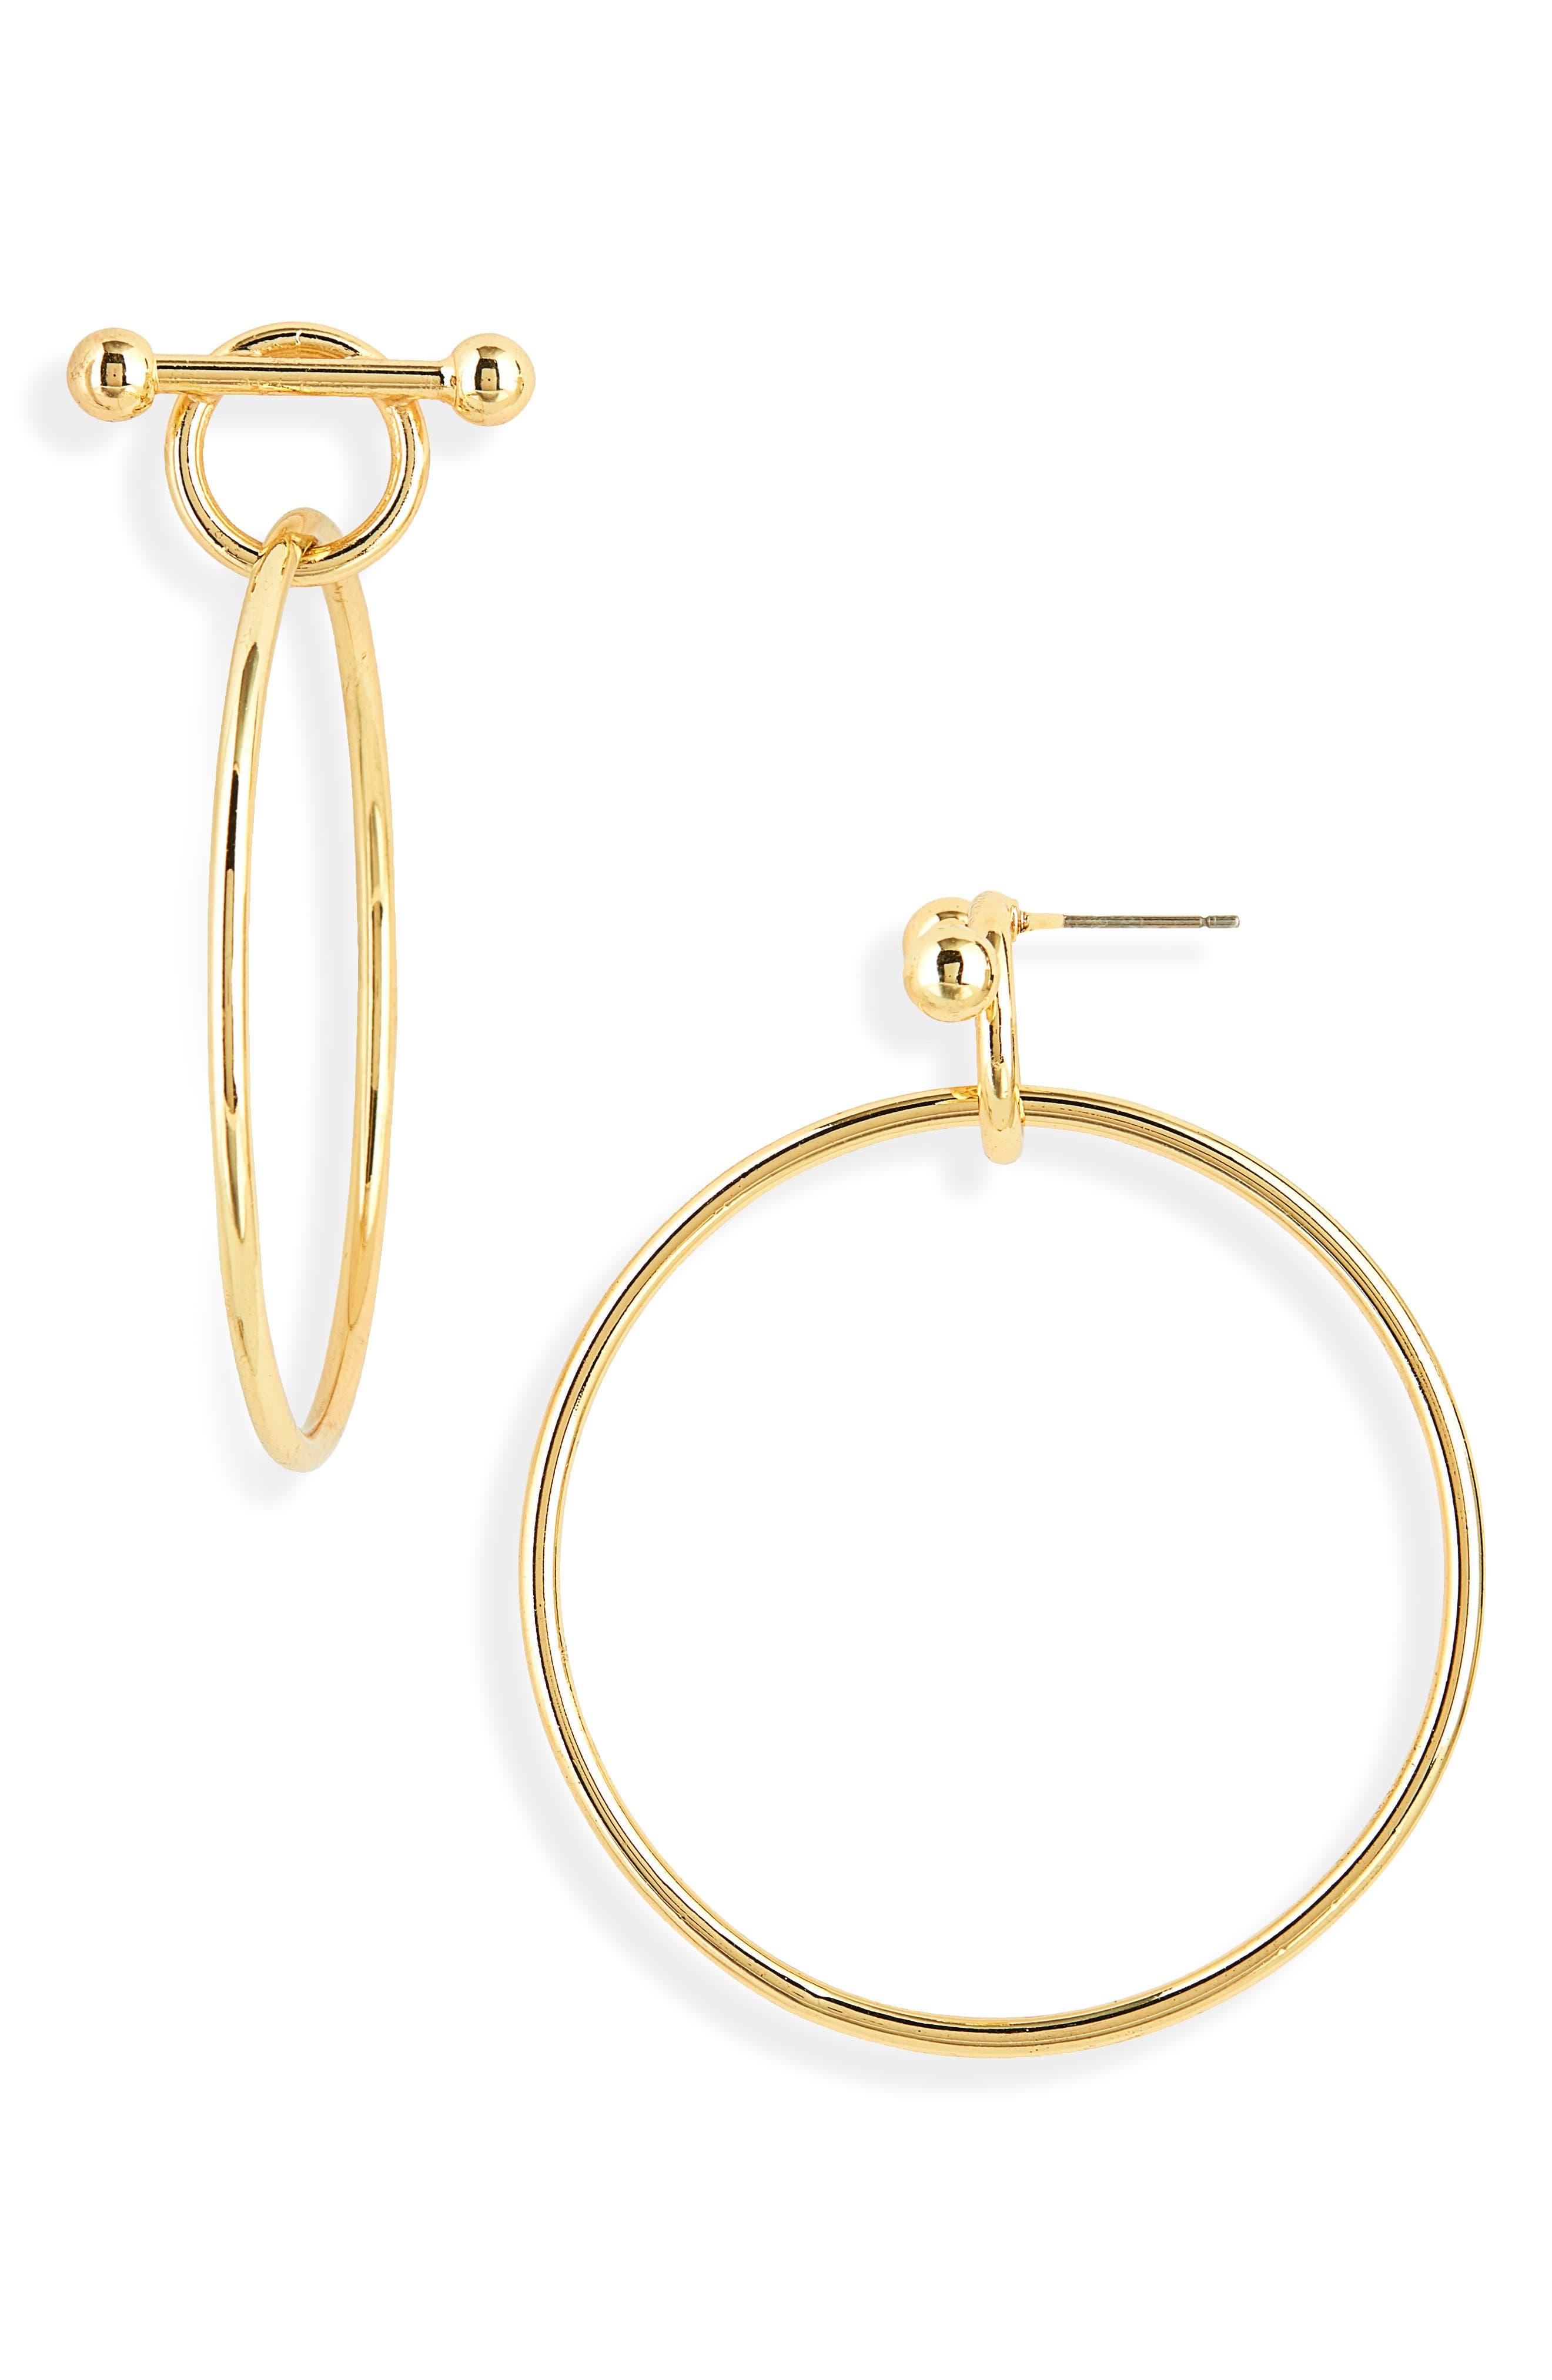 STELLA + RUBY, Double Circle Drop Hoop Earrings, Main thumbnail 1, color, 710